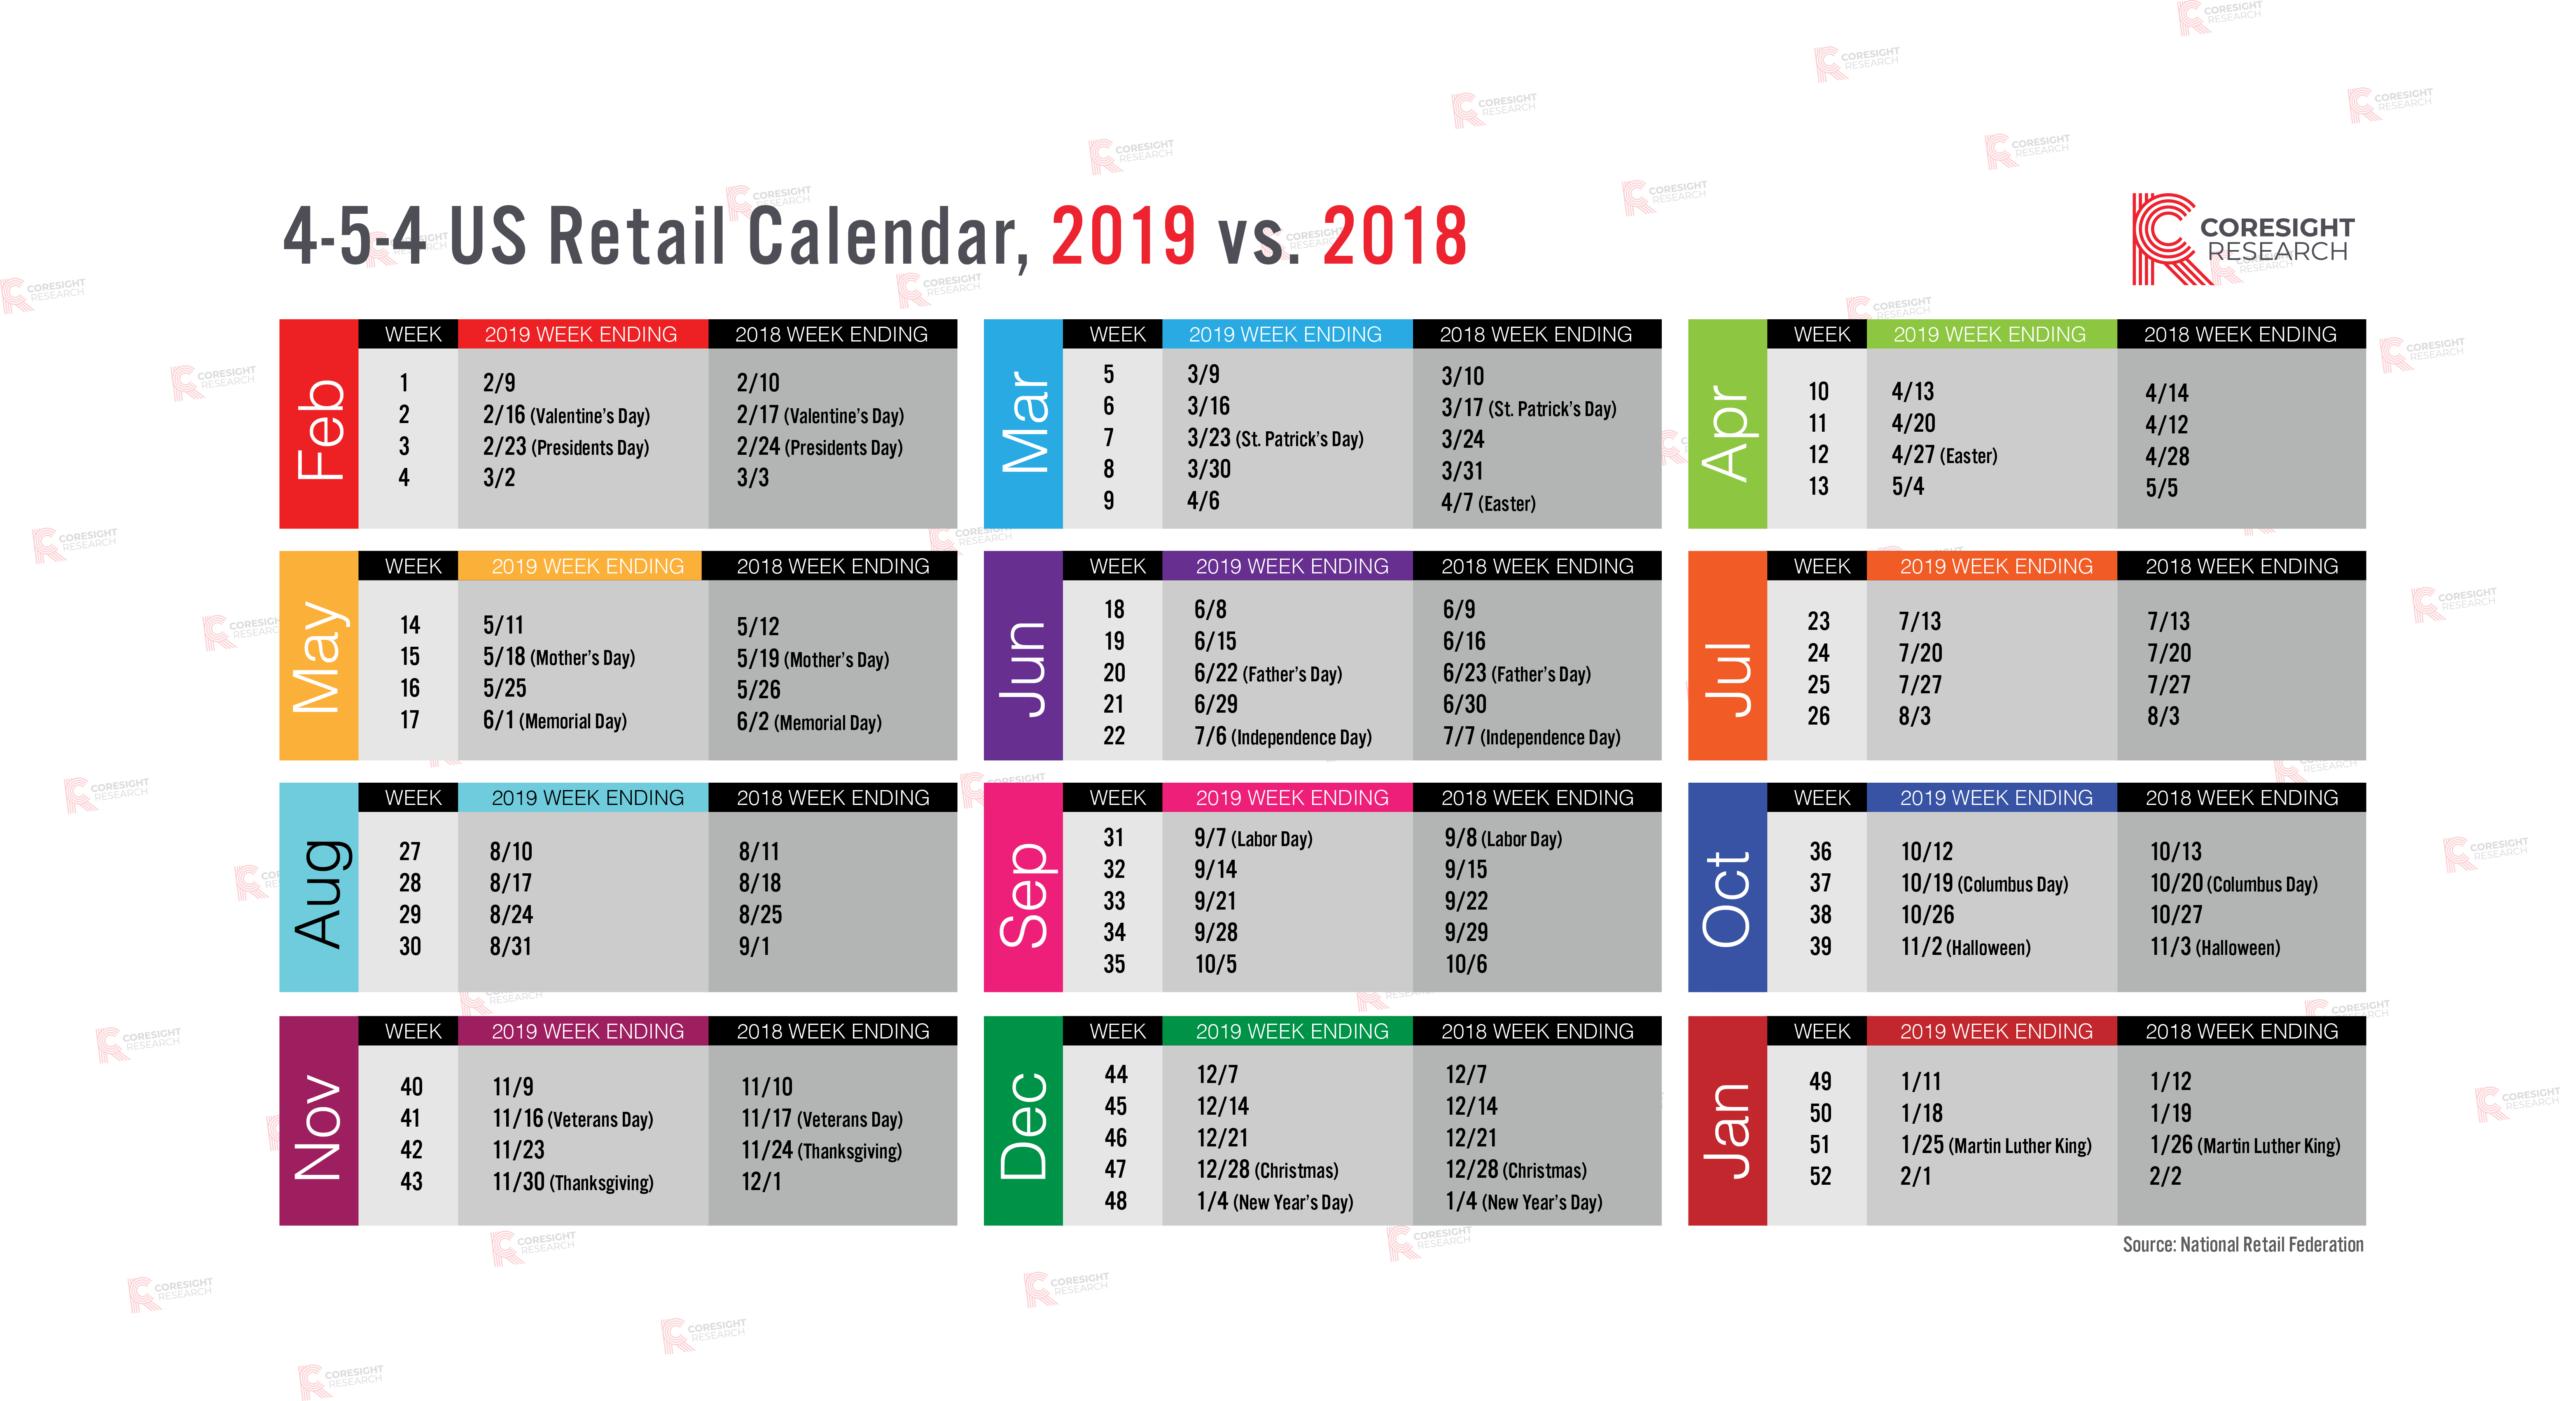 4-5-4 Us Retail Calendar, 2019 Vs. 2018 | Coresight Research